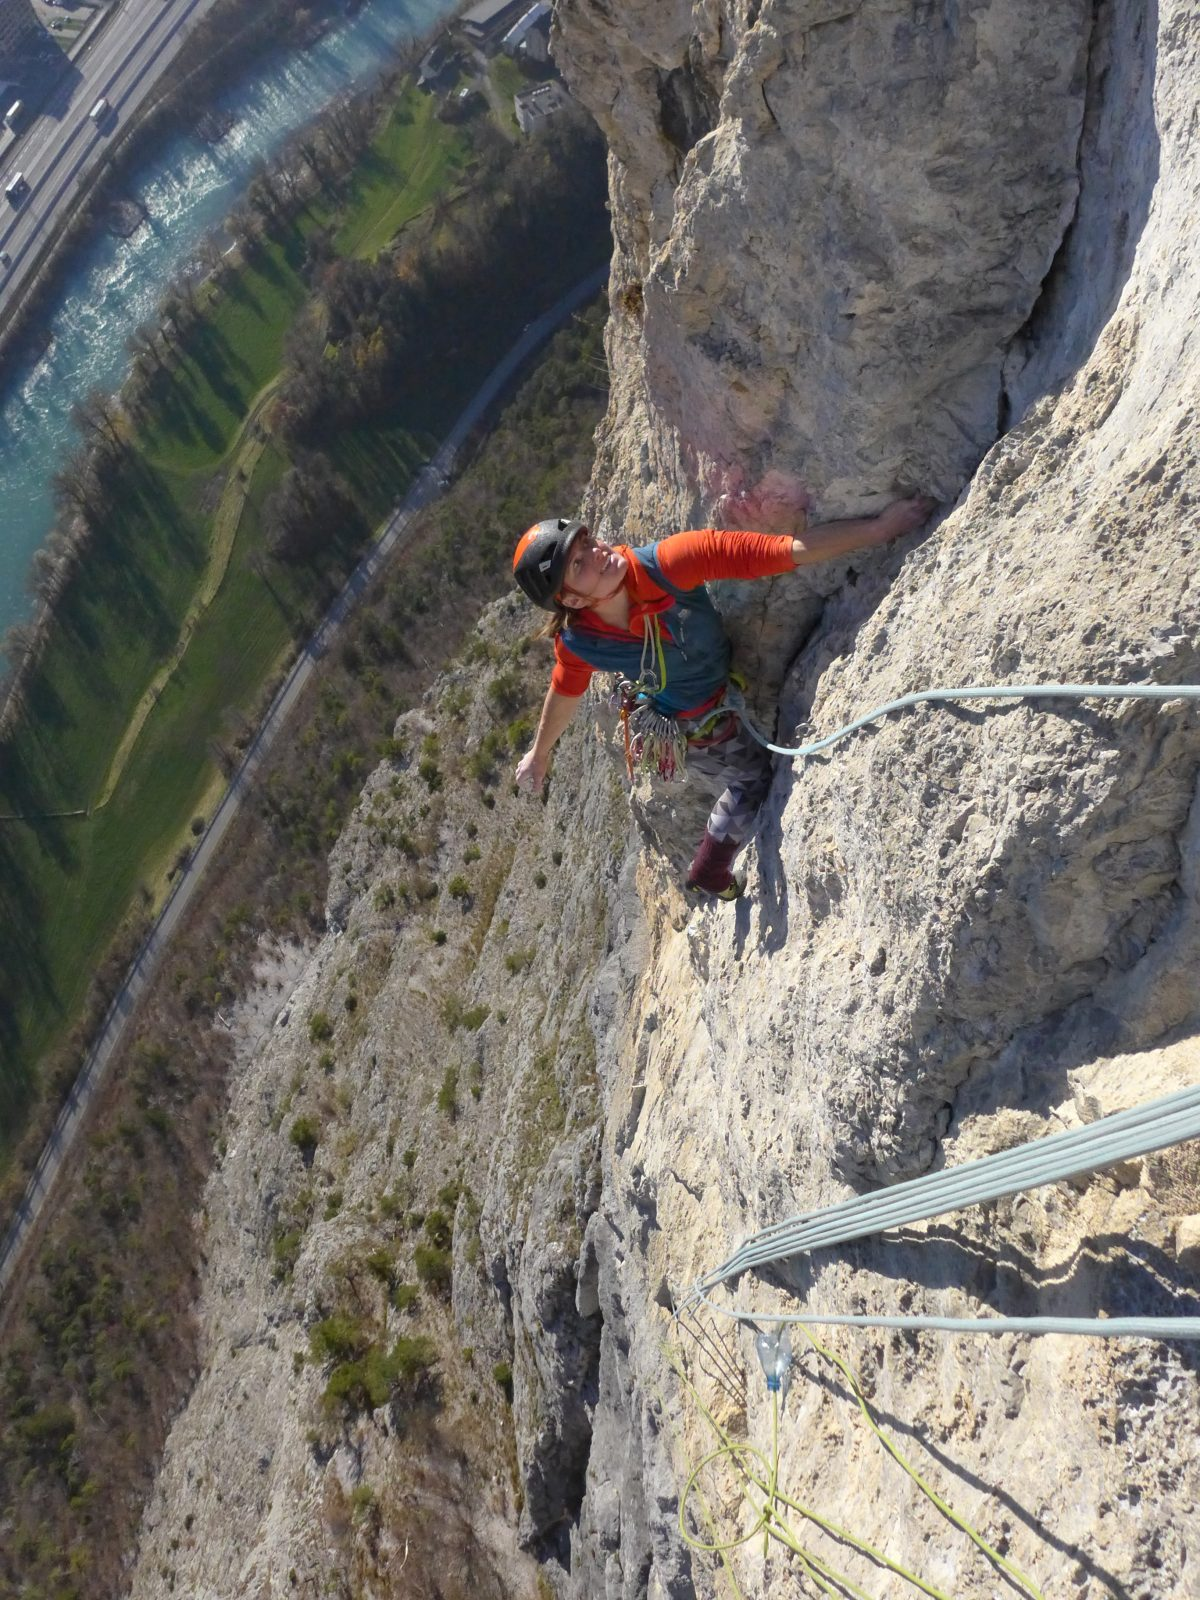 Susi Süßmeier, Frauenpower im Fels, Foto: Susi Süßmeier |Climbers Paradise